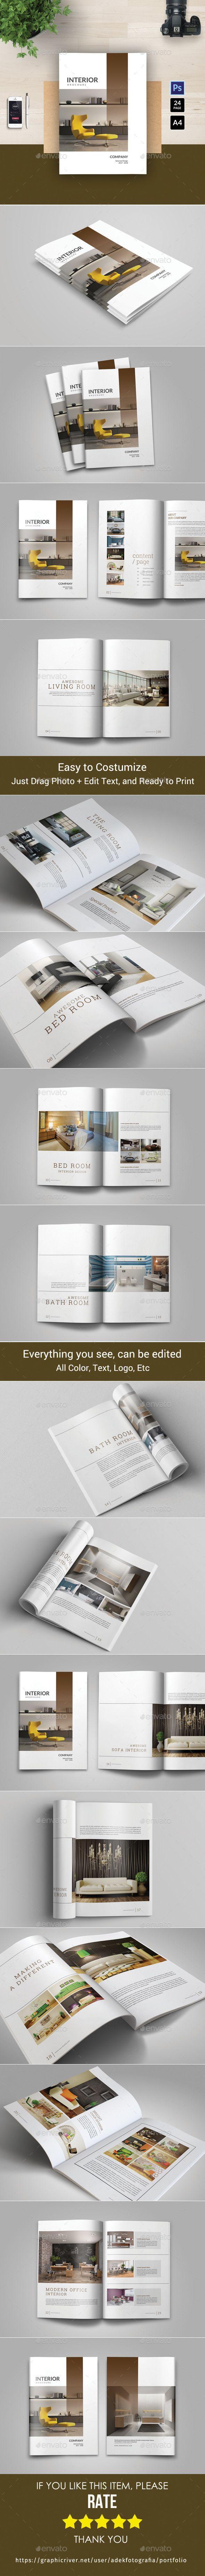 Portfolio Brochure Template PSD